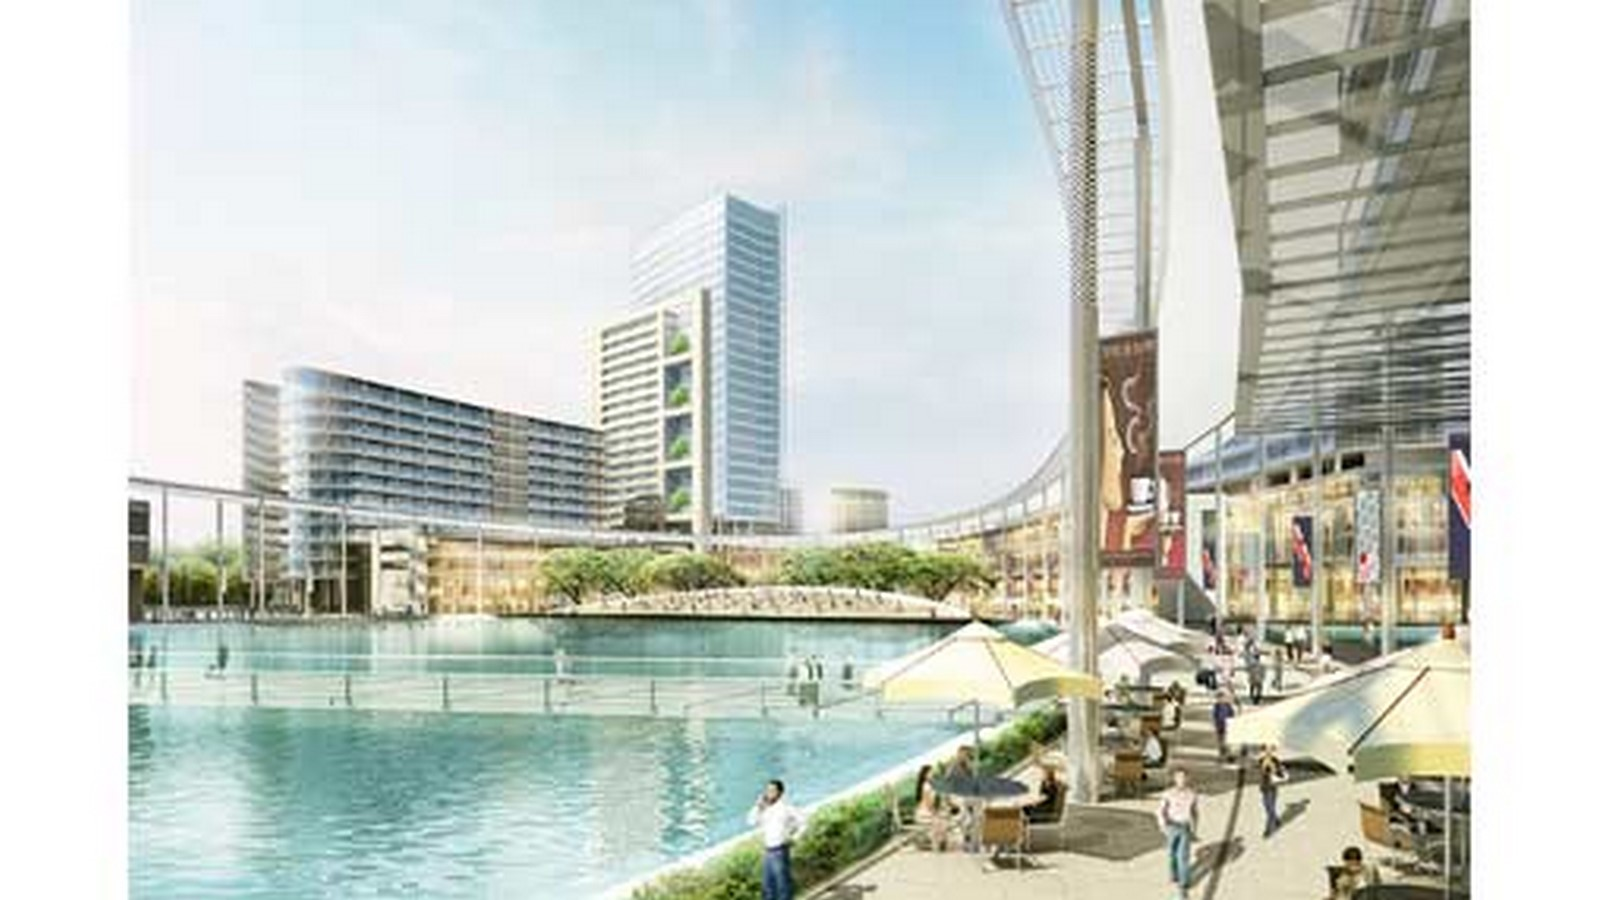 Gensler- 10 Cities & Urban Design Projects Sheet28